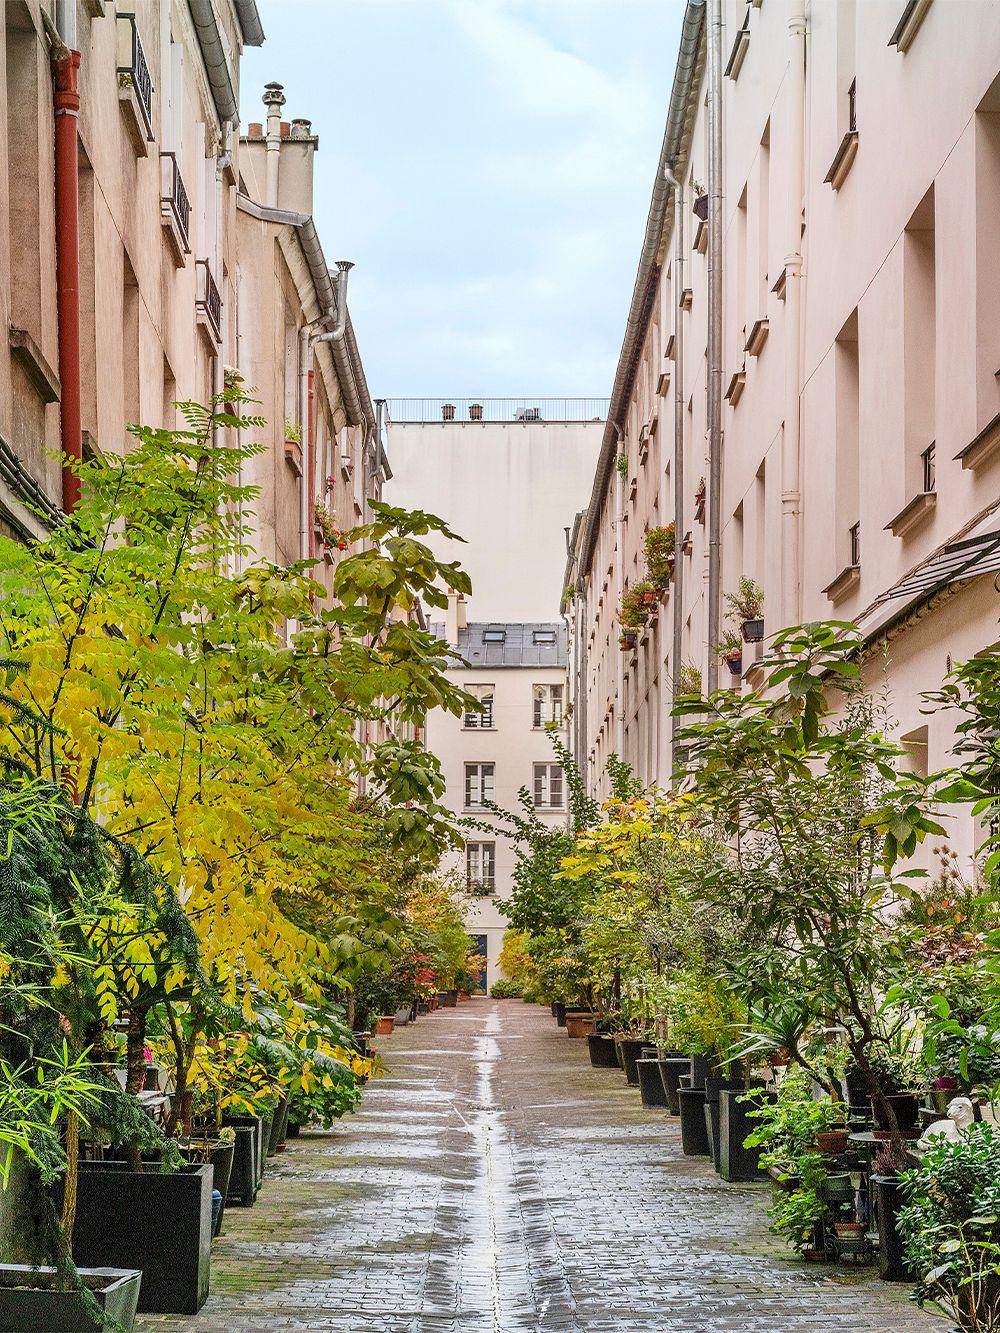 Lushly courtyard at rue du Fauborg-Saint-Denis, Paris